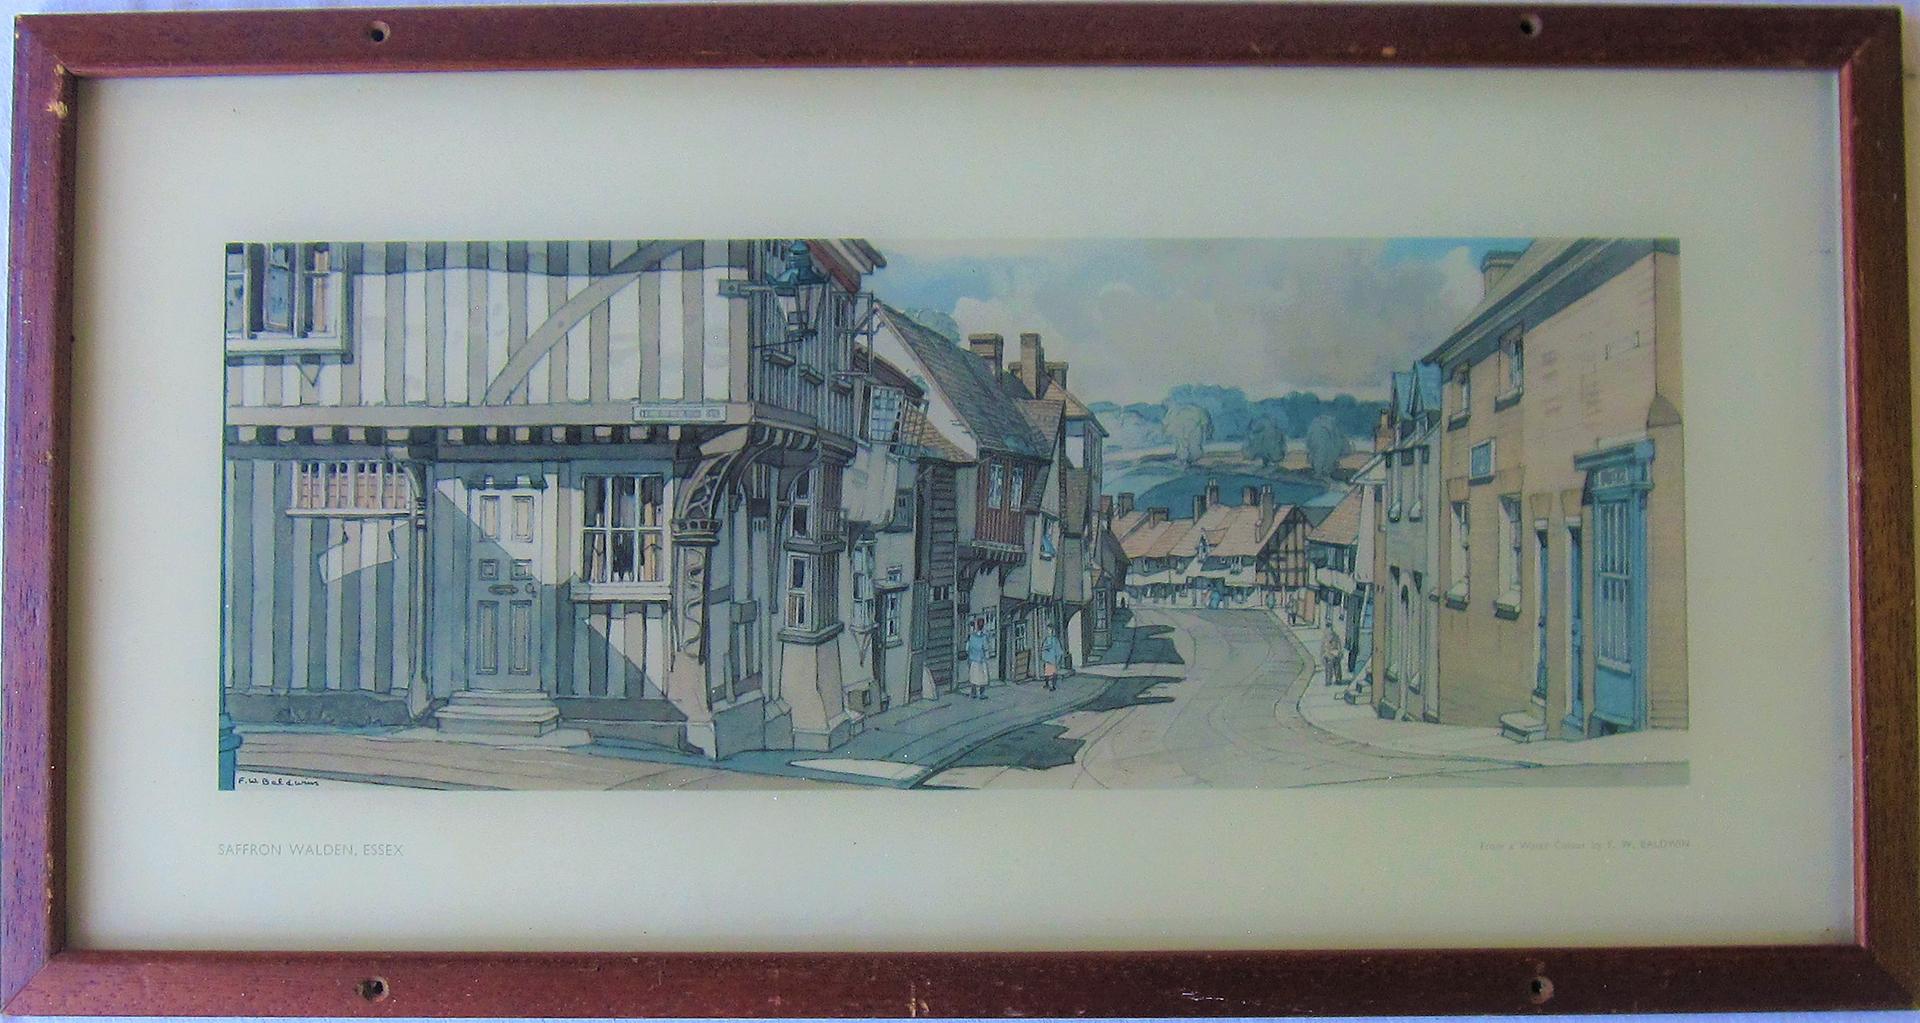 Framed & Glazed Carriage Print. SAFFFON WALDEN by F Baldwin in original frame.